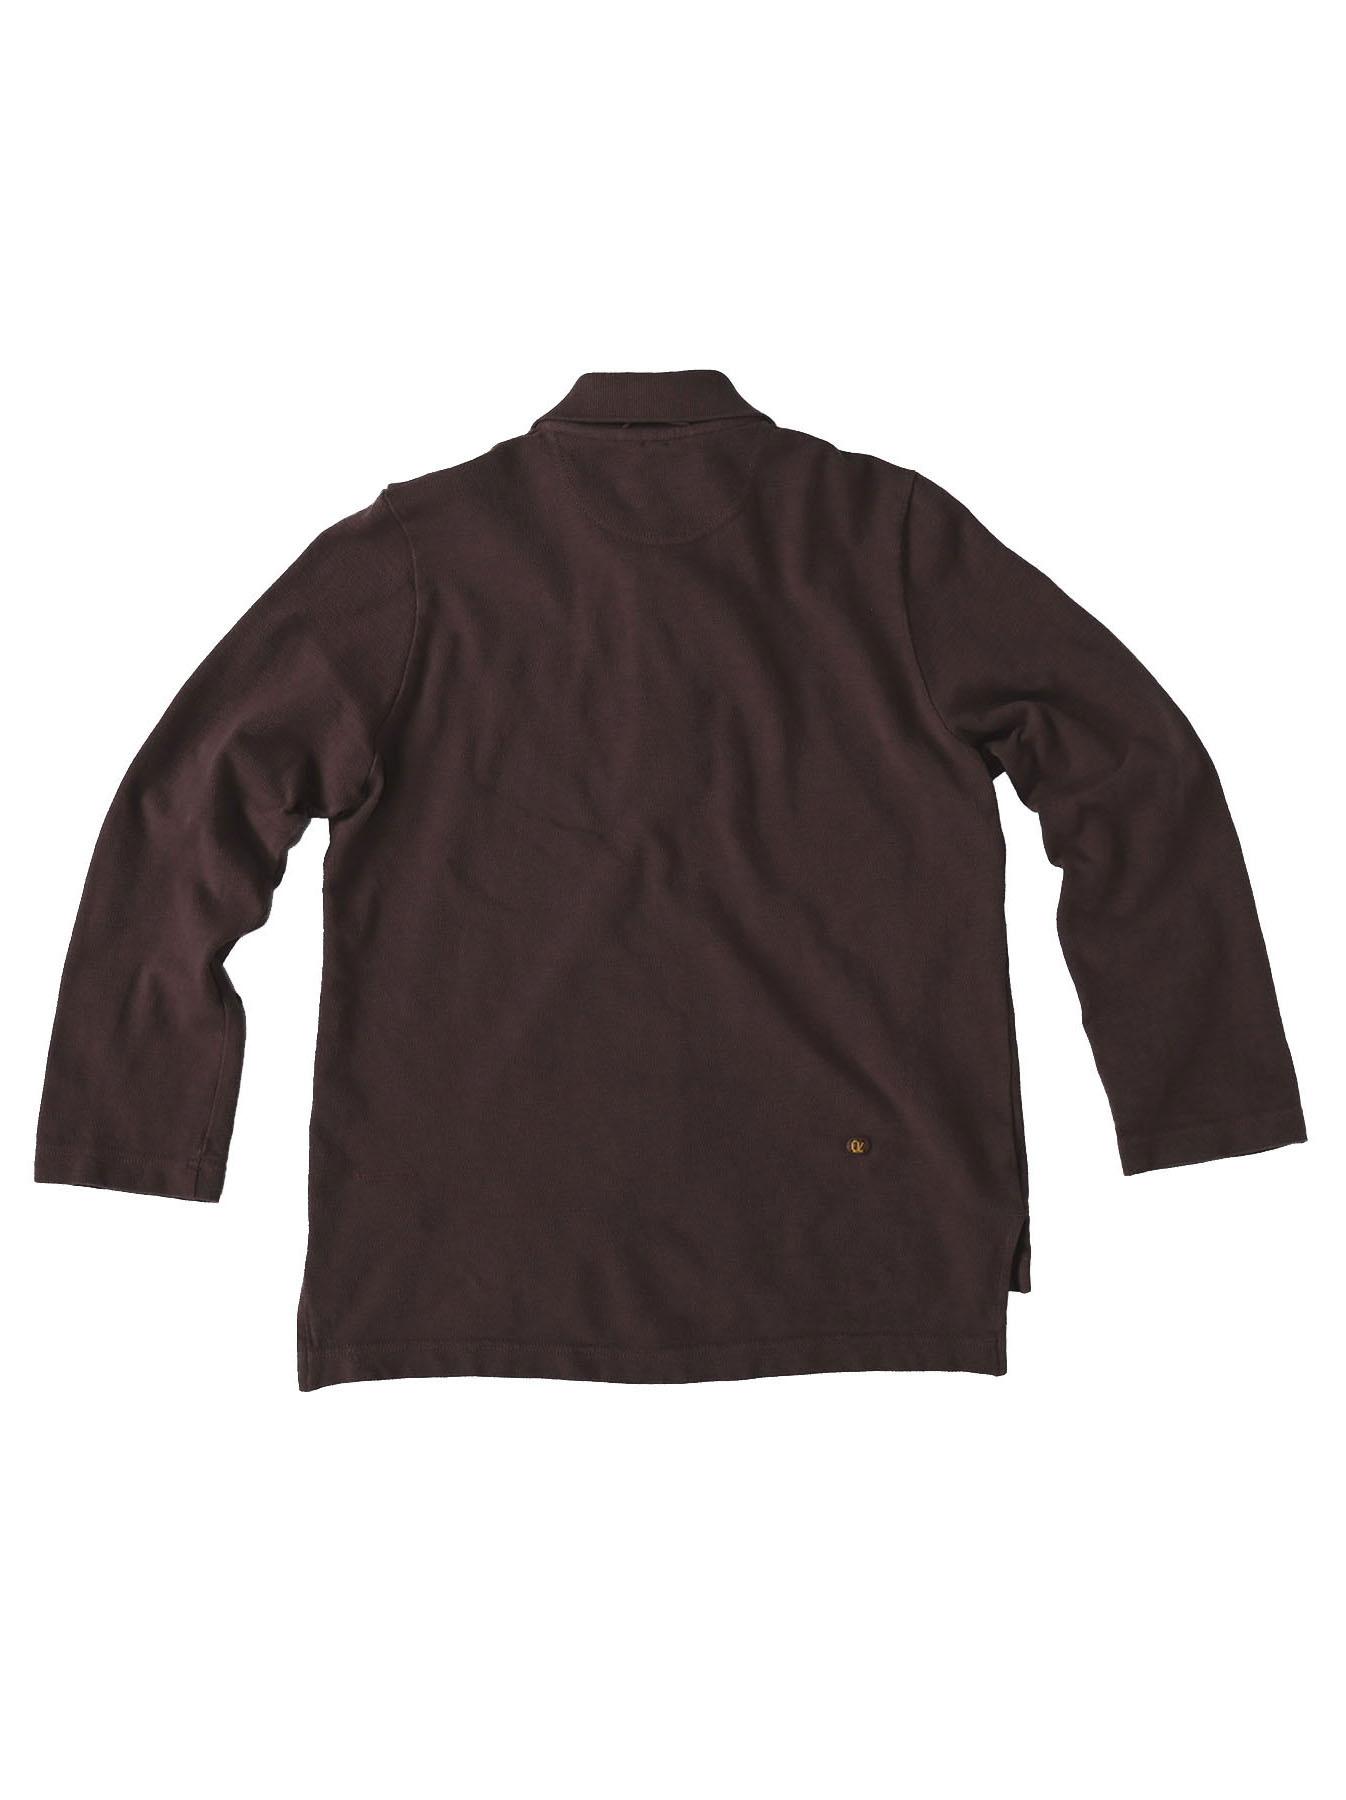 Kanoko Shiokaze Long-sleeved Square Polo Shirt (0521)-8